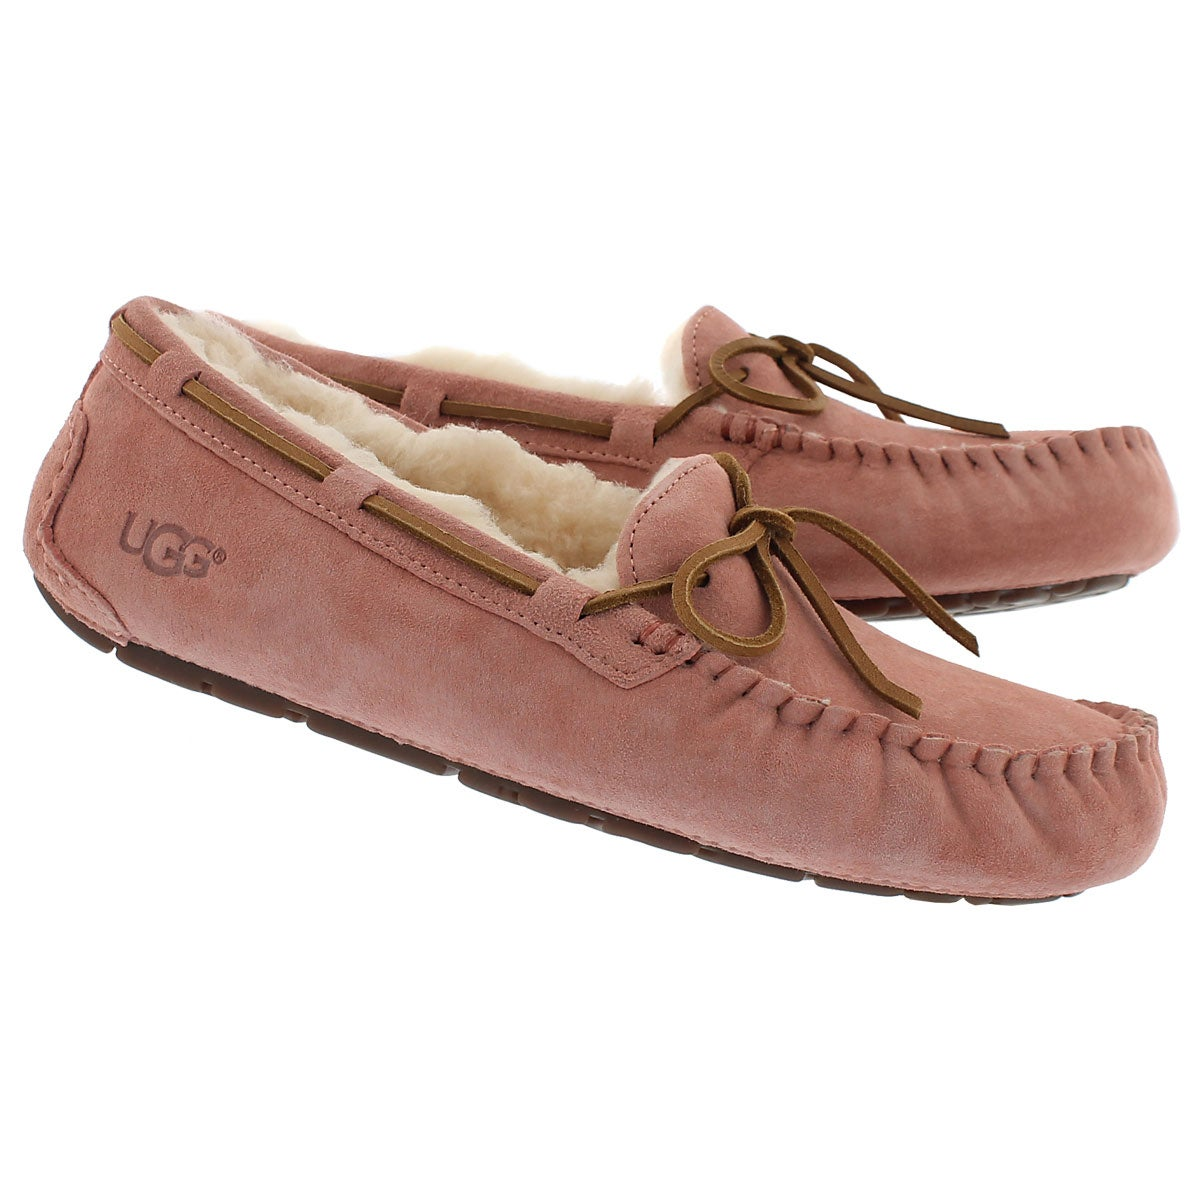 Lds Dakota chemise pink sheepskin moc